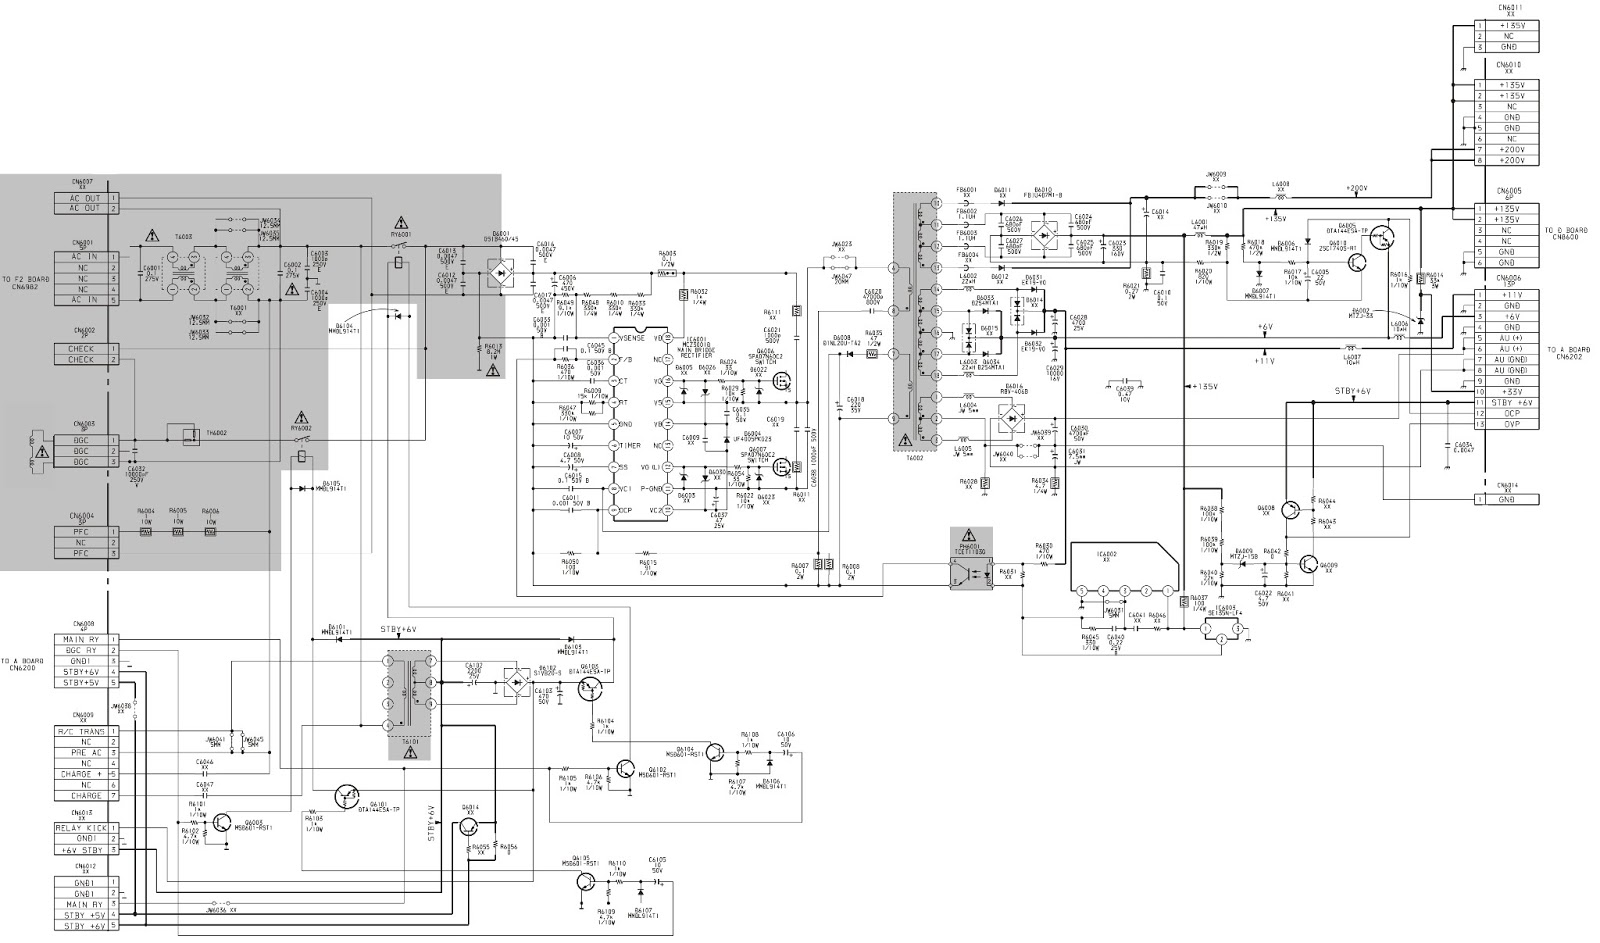 Sony Trinitron Kv28ls60 - Kv32ls60 - Power